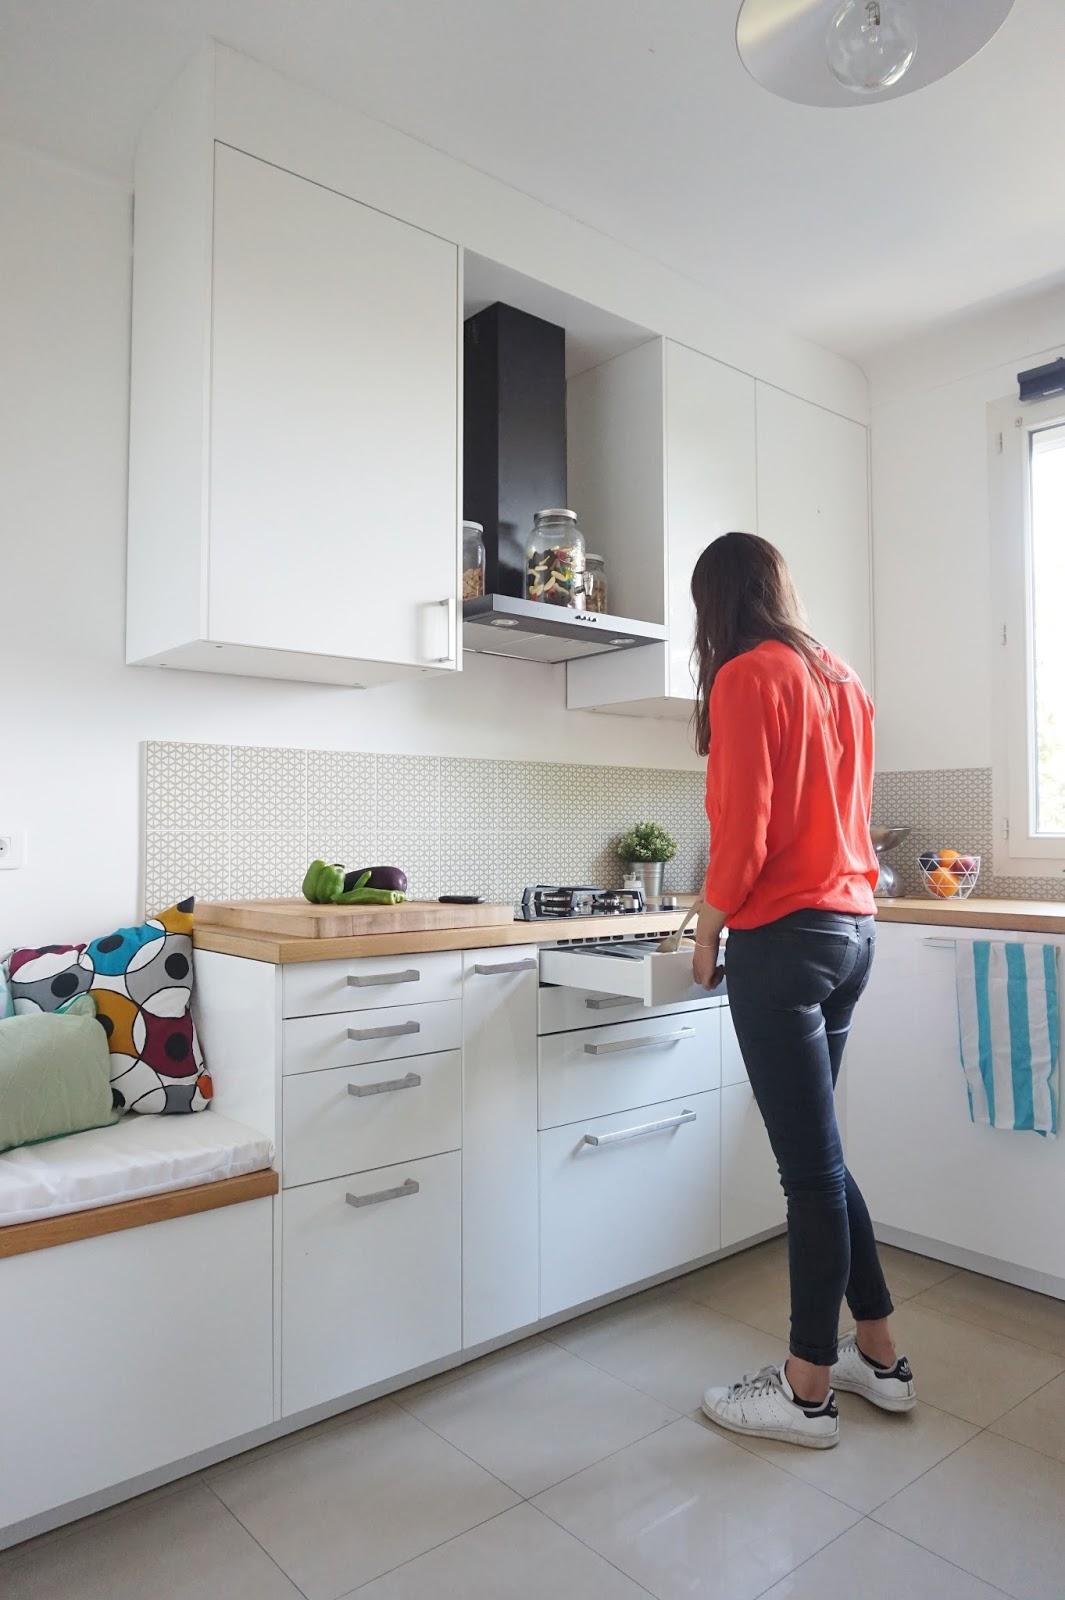 Cuisine Savedal Ikea Perfect Ikea White Cabinets Kitchen Kitchen